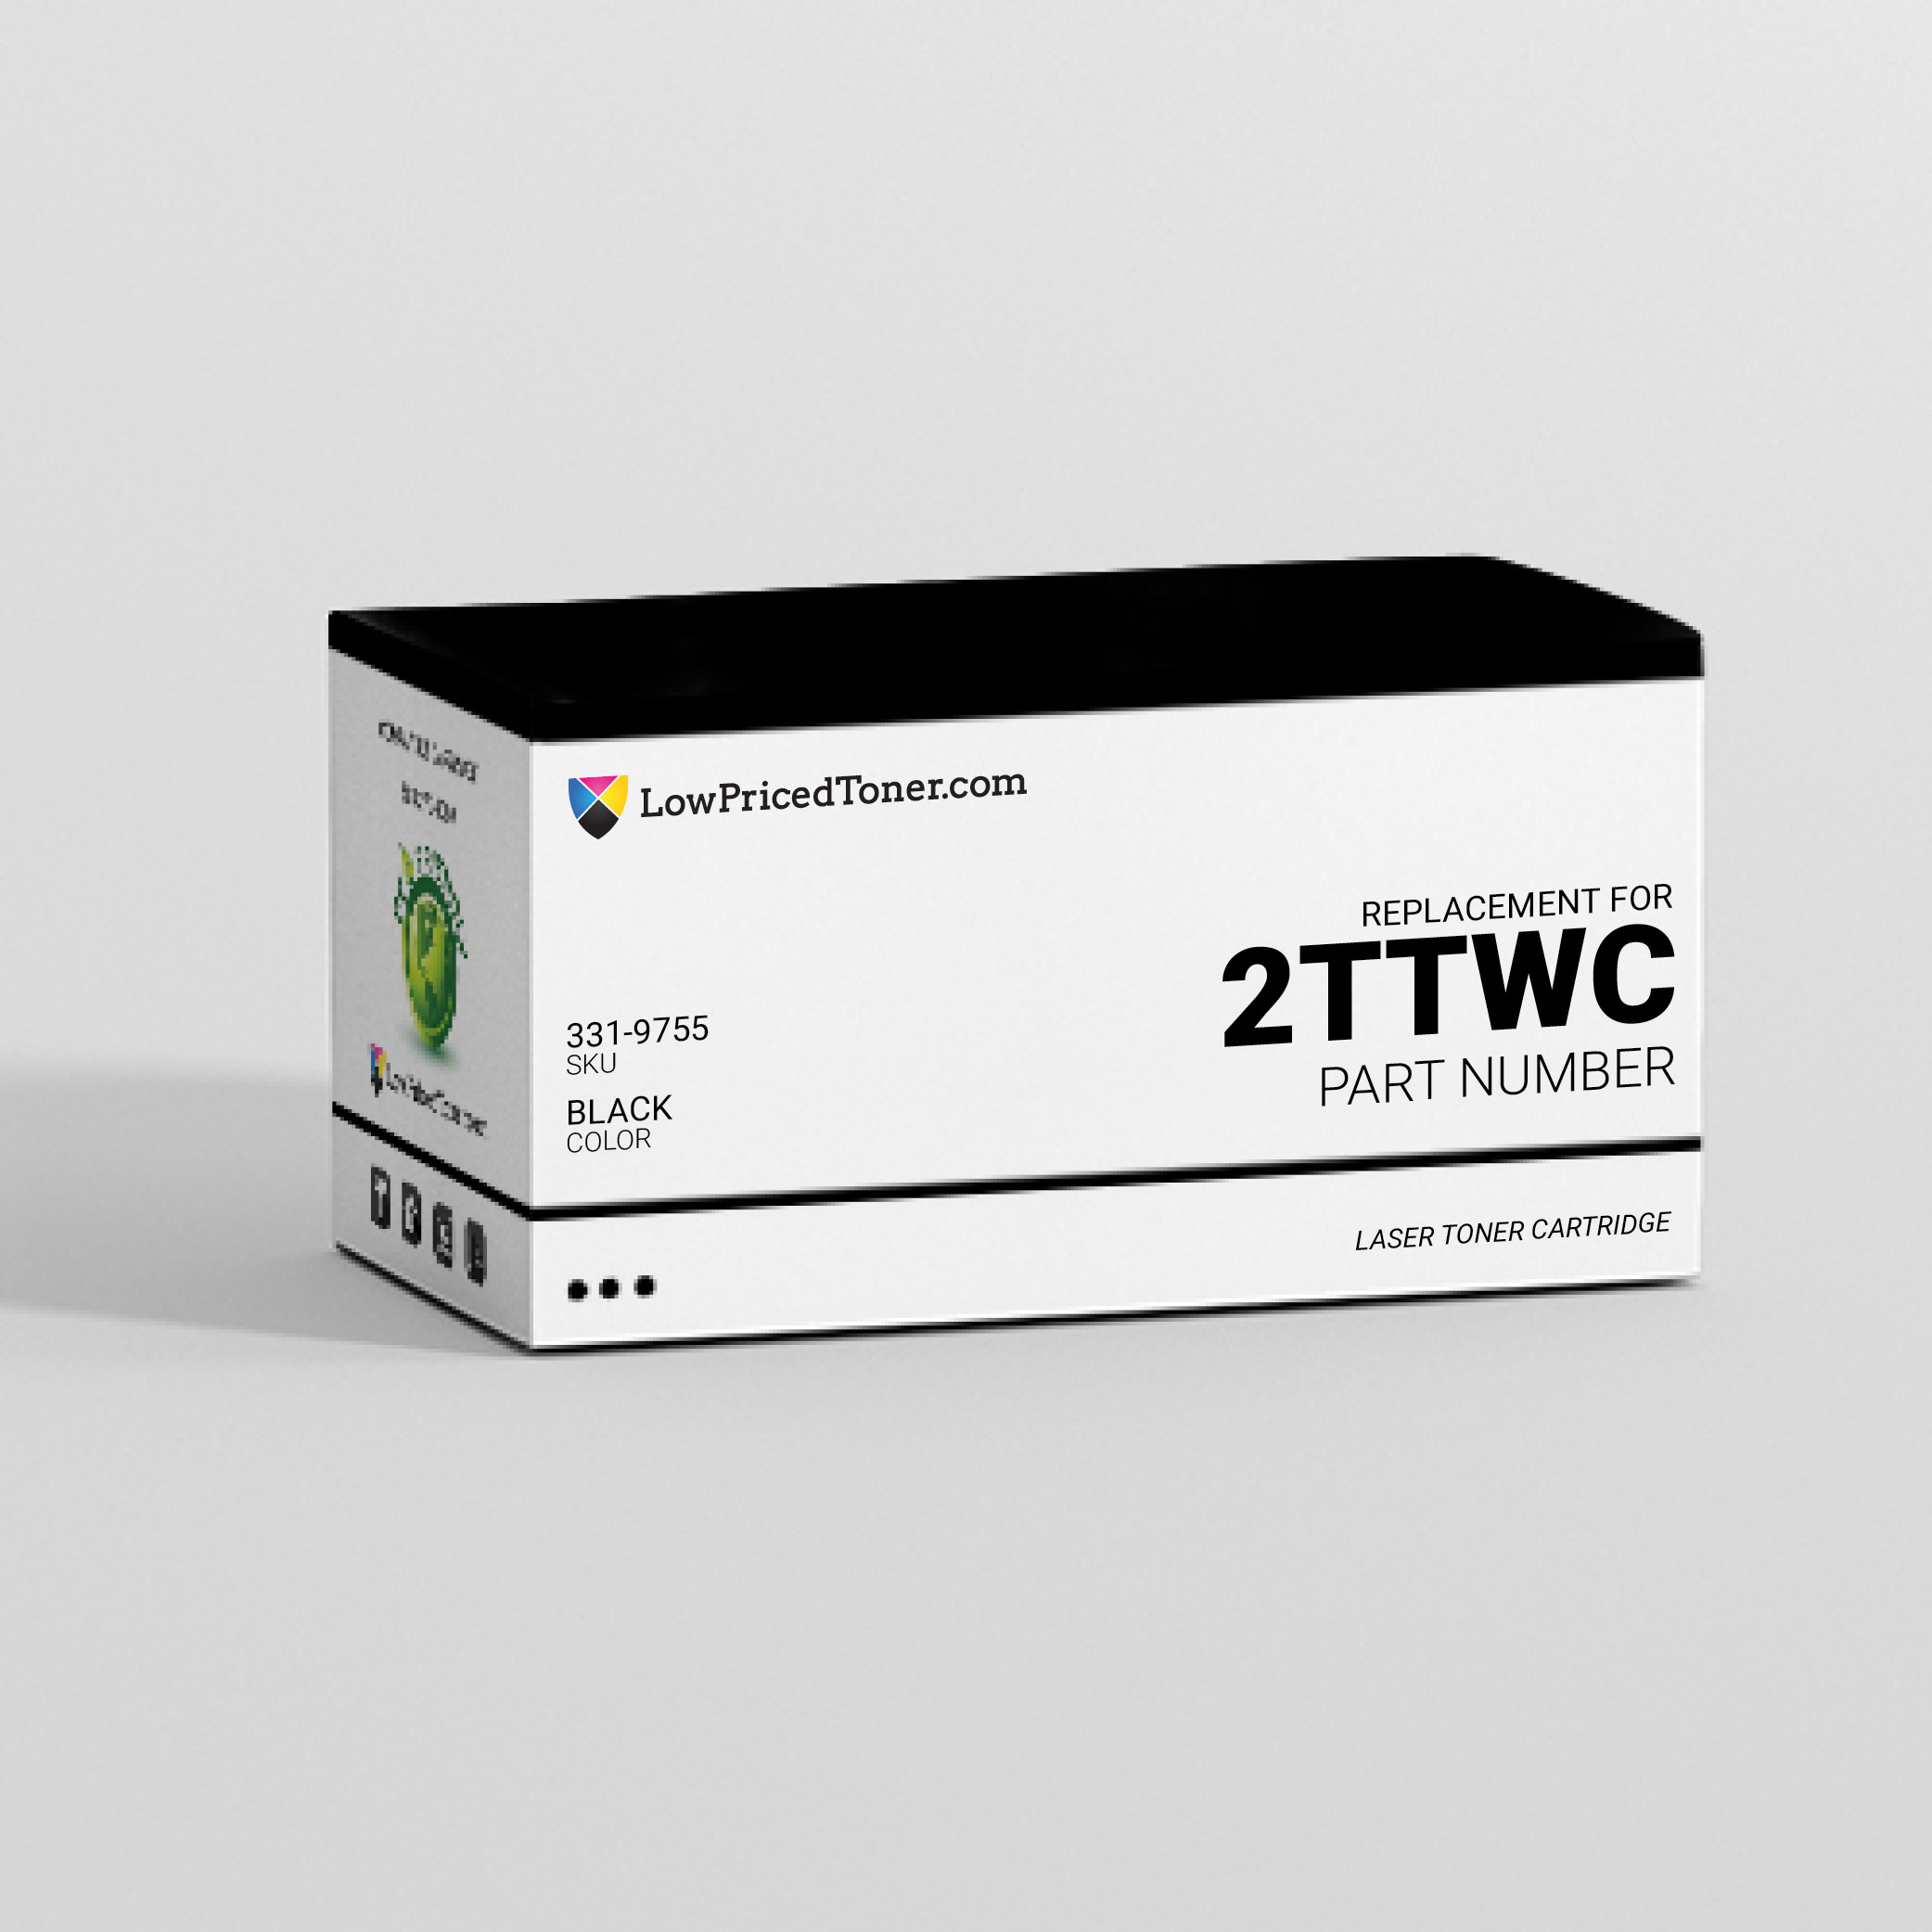 Dell 331-9755 2TTWC Remanufactured Black Laser Toner Cartridge